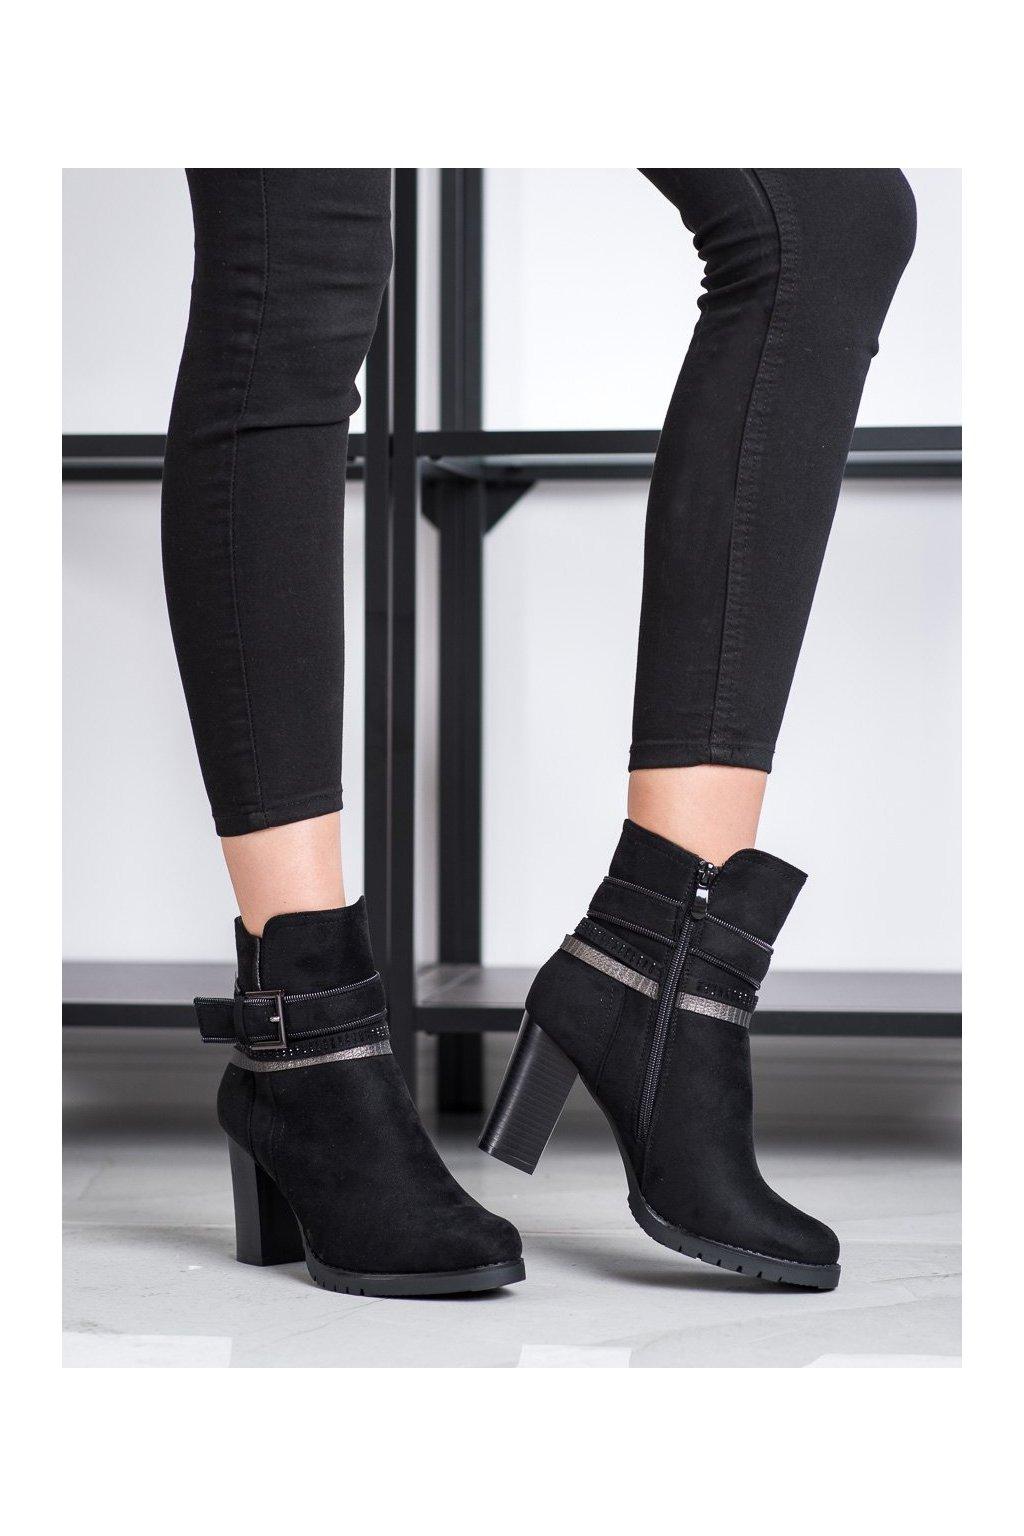 Čierne dámske topánky Queentina kod BH126B